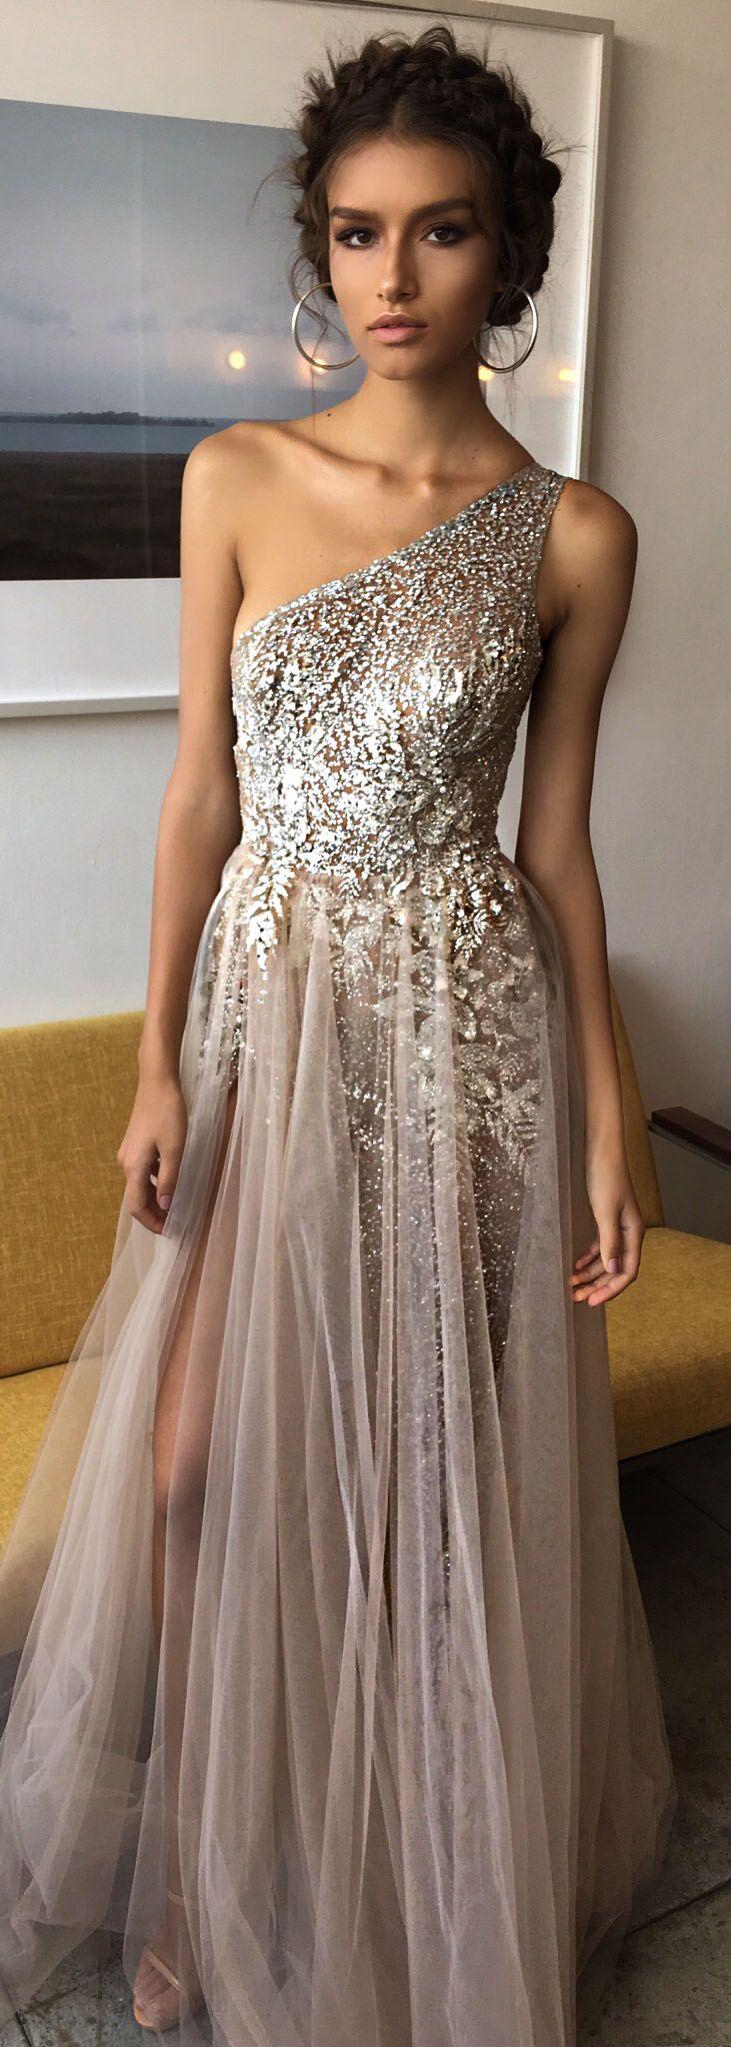 best beautiful dresses images on pinterest ball gown ballroom